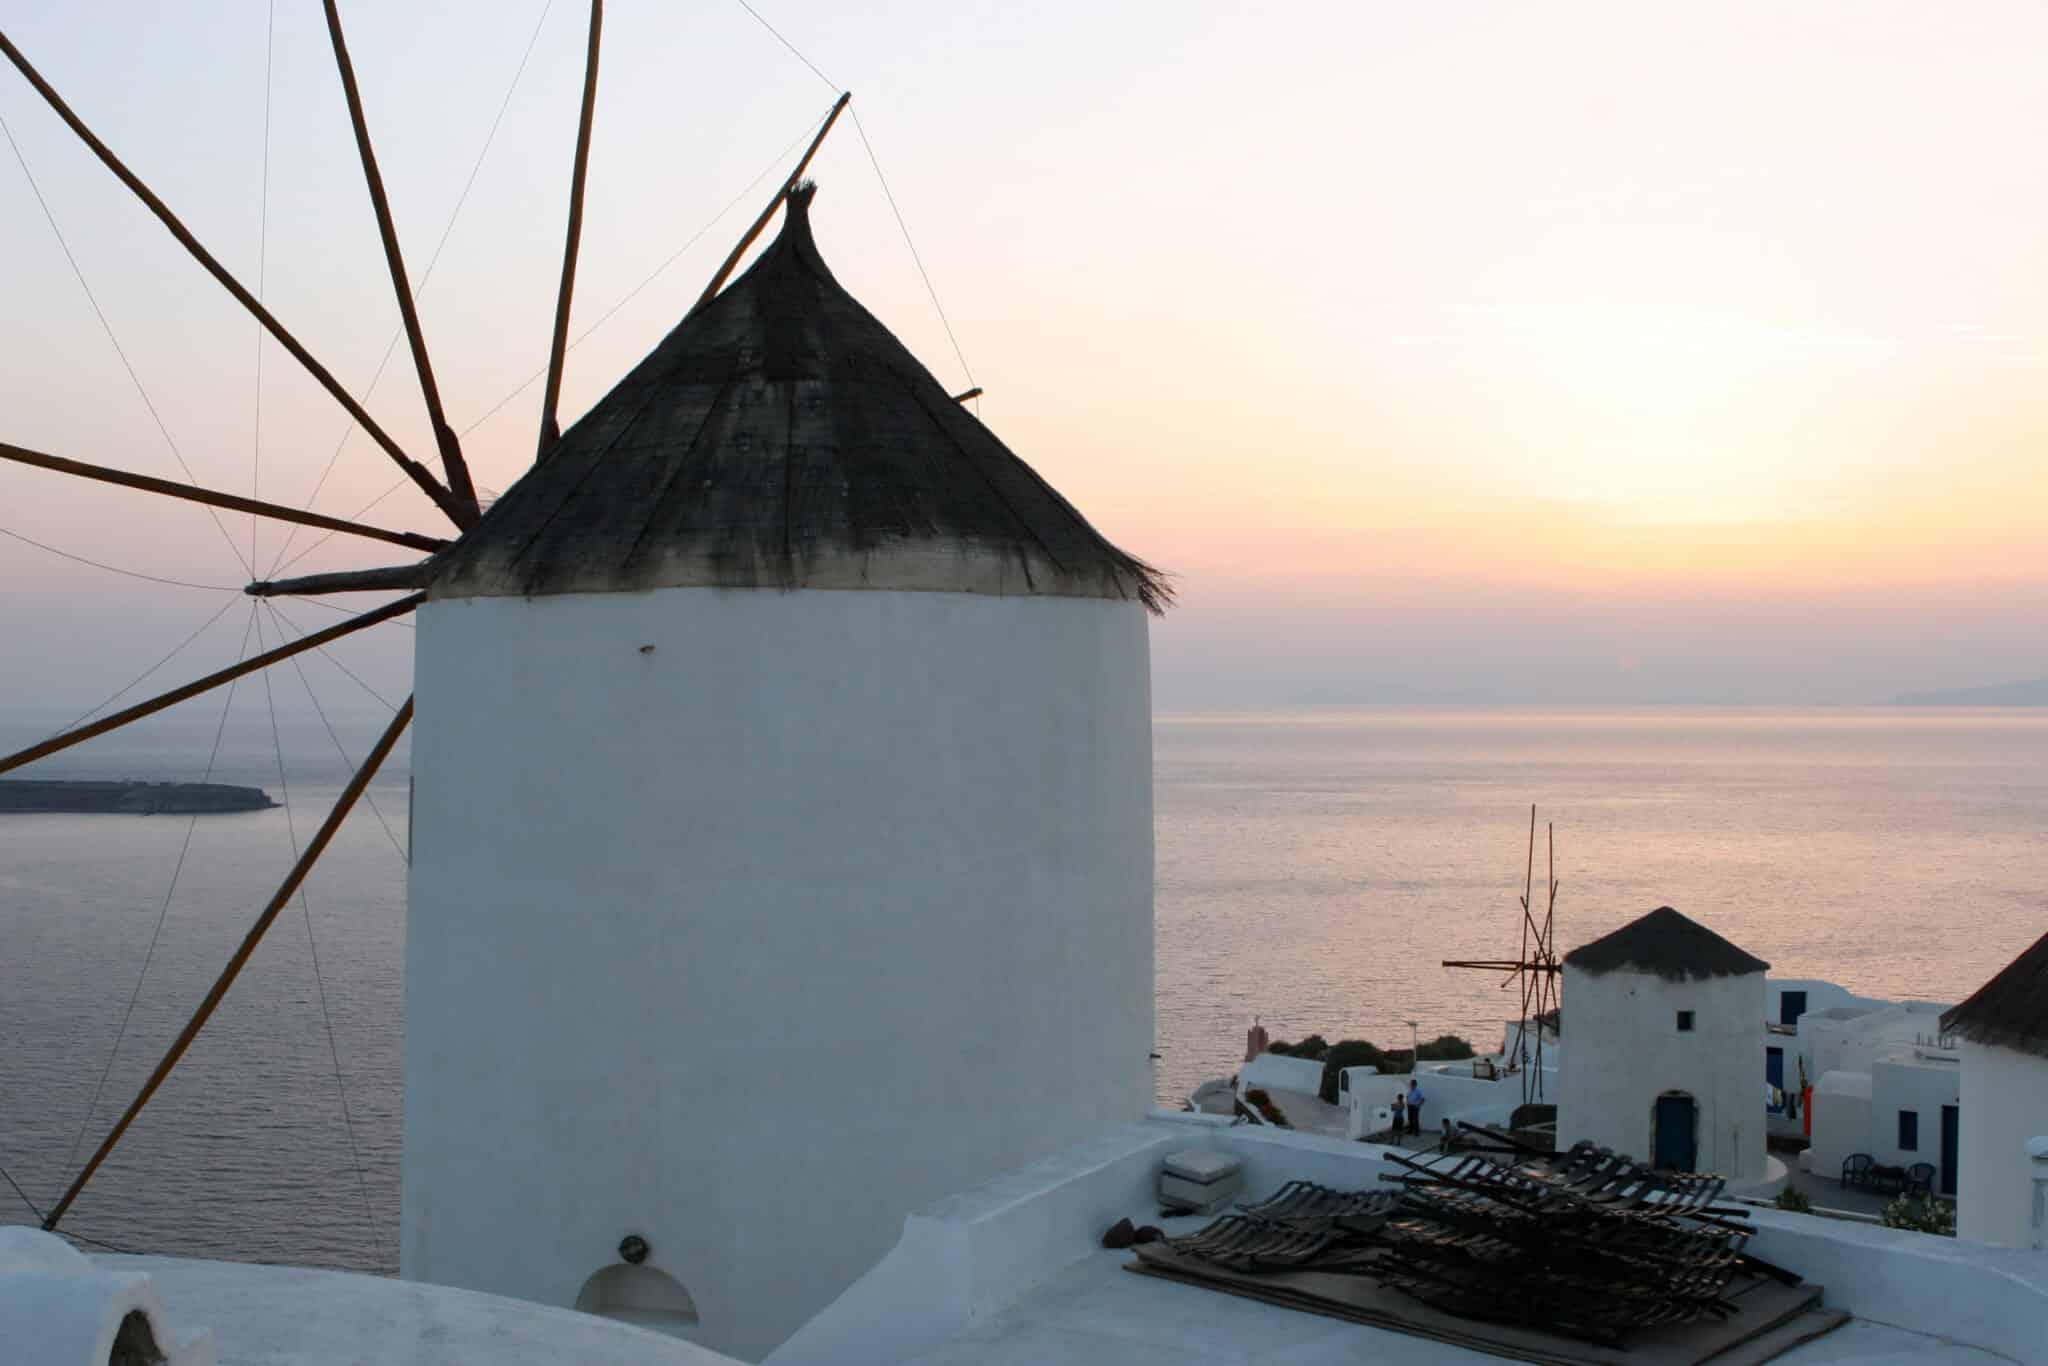 Santorini Windmill at Sunset. Photo courtesy of Steve Cronin.